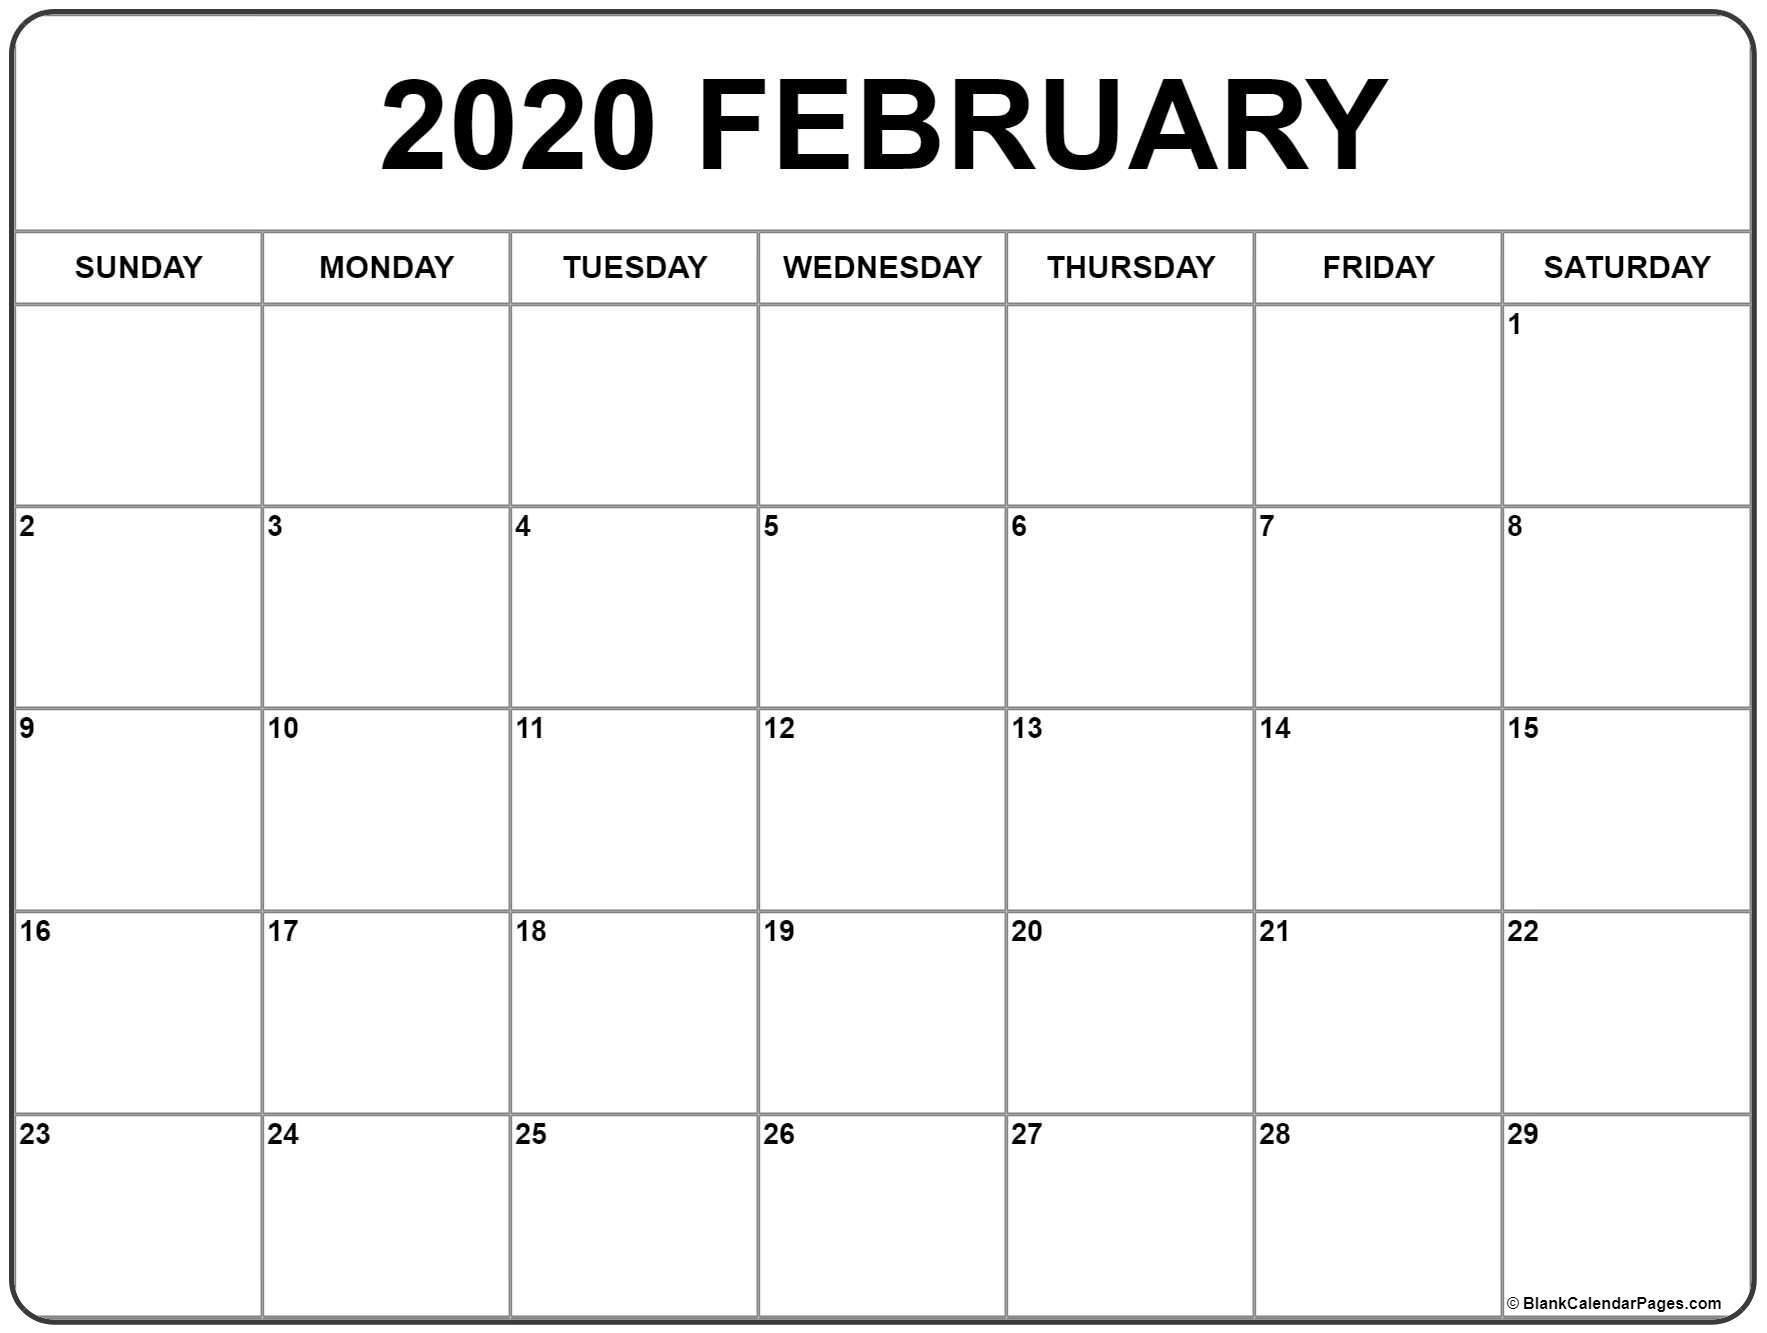 February 2020 Calendar   Free Printable Monthly Calendars regarding Blank 2020 Calendar Starting On Saturday Printable Free